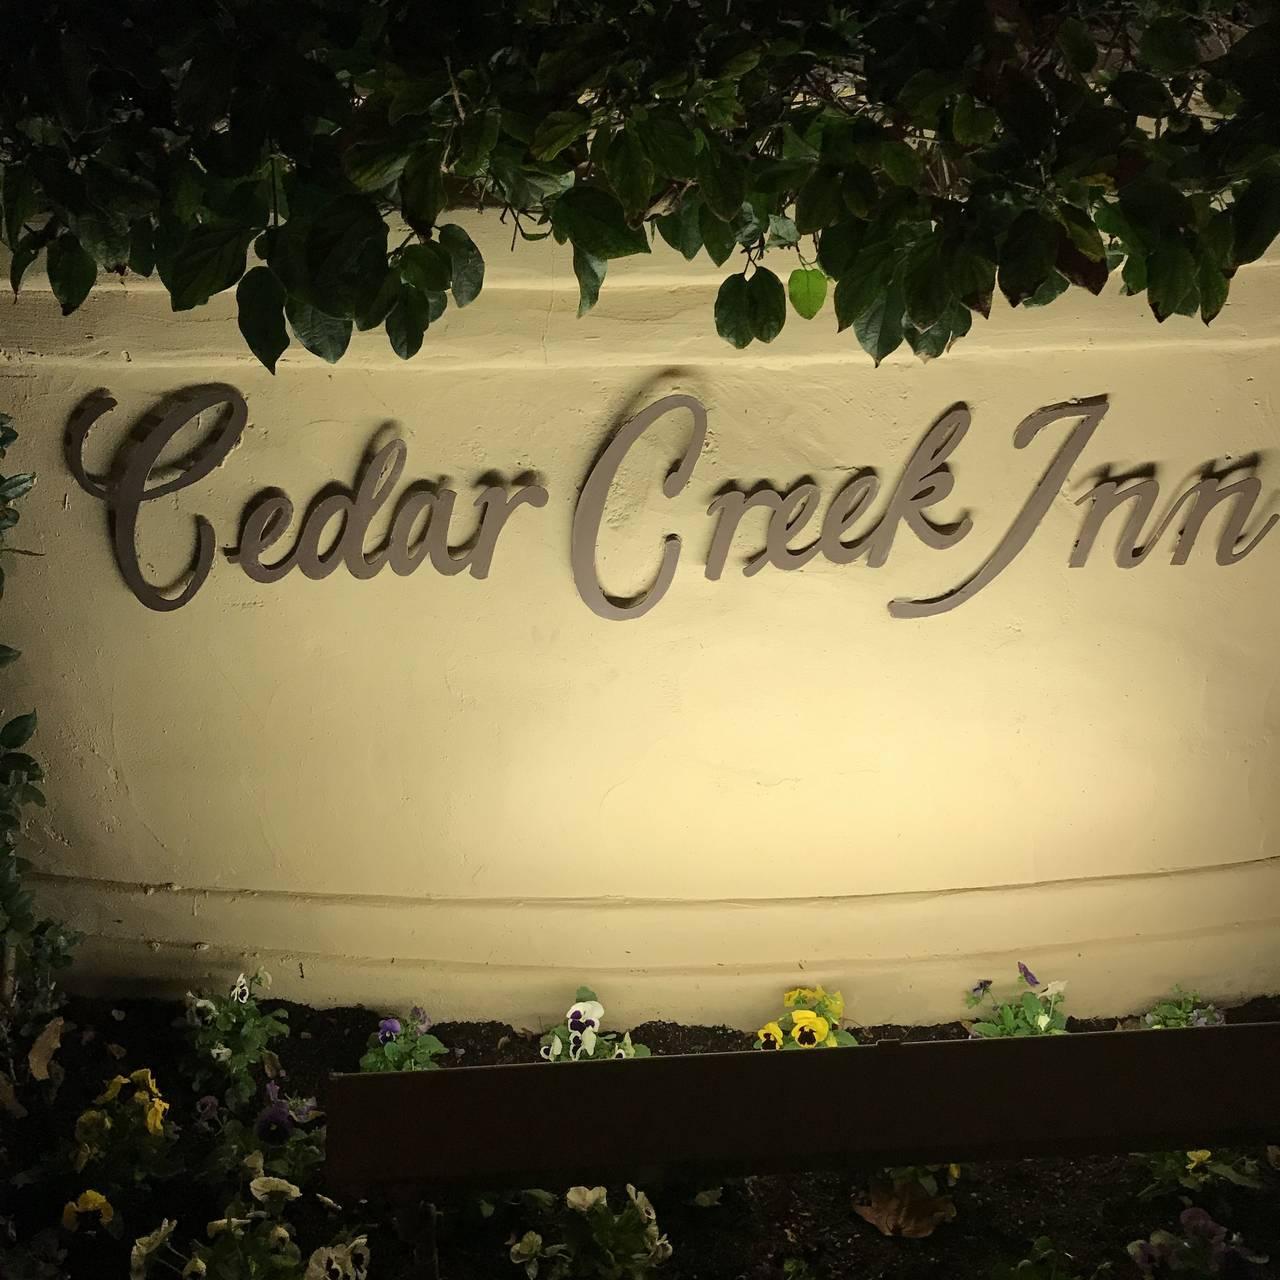 Cedar creek inn palm springs